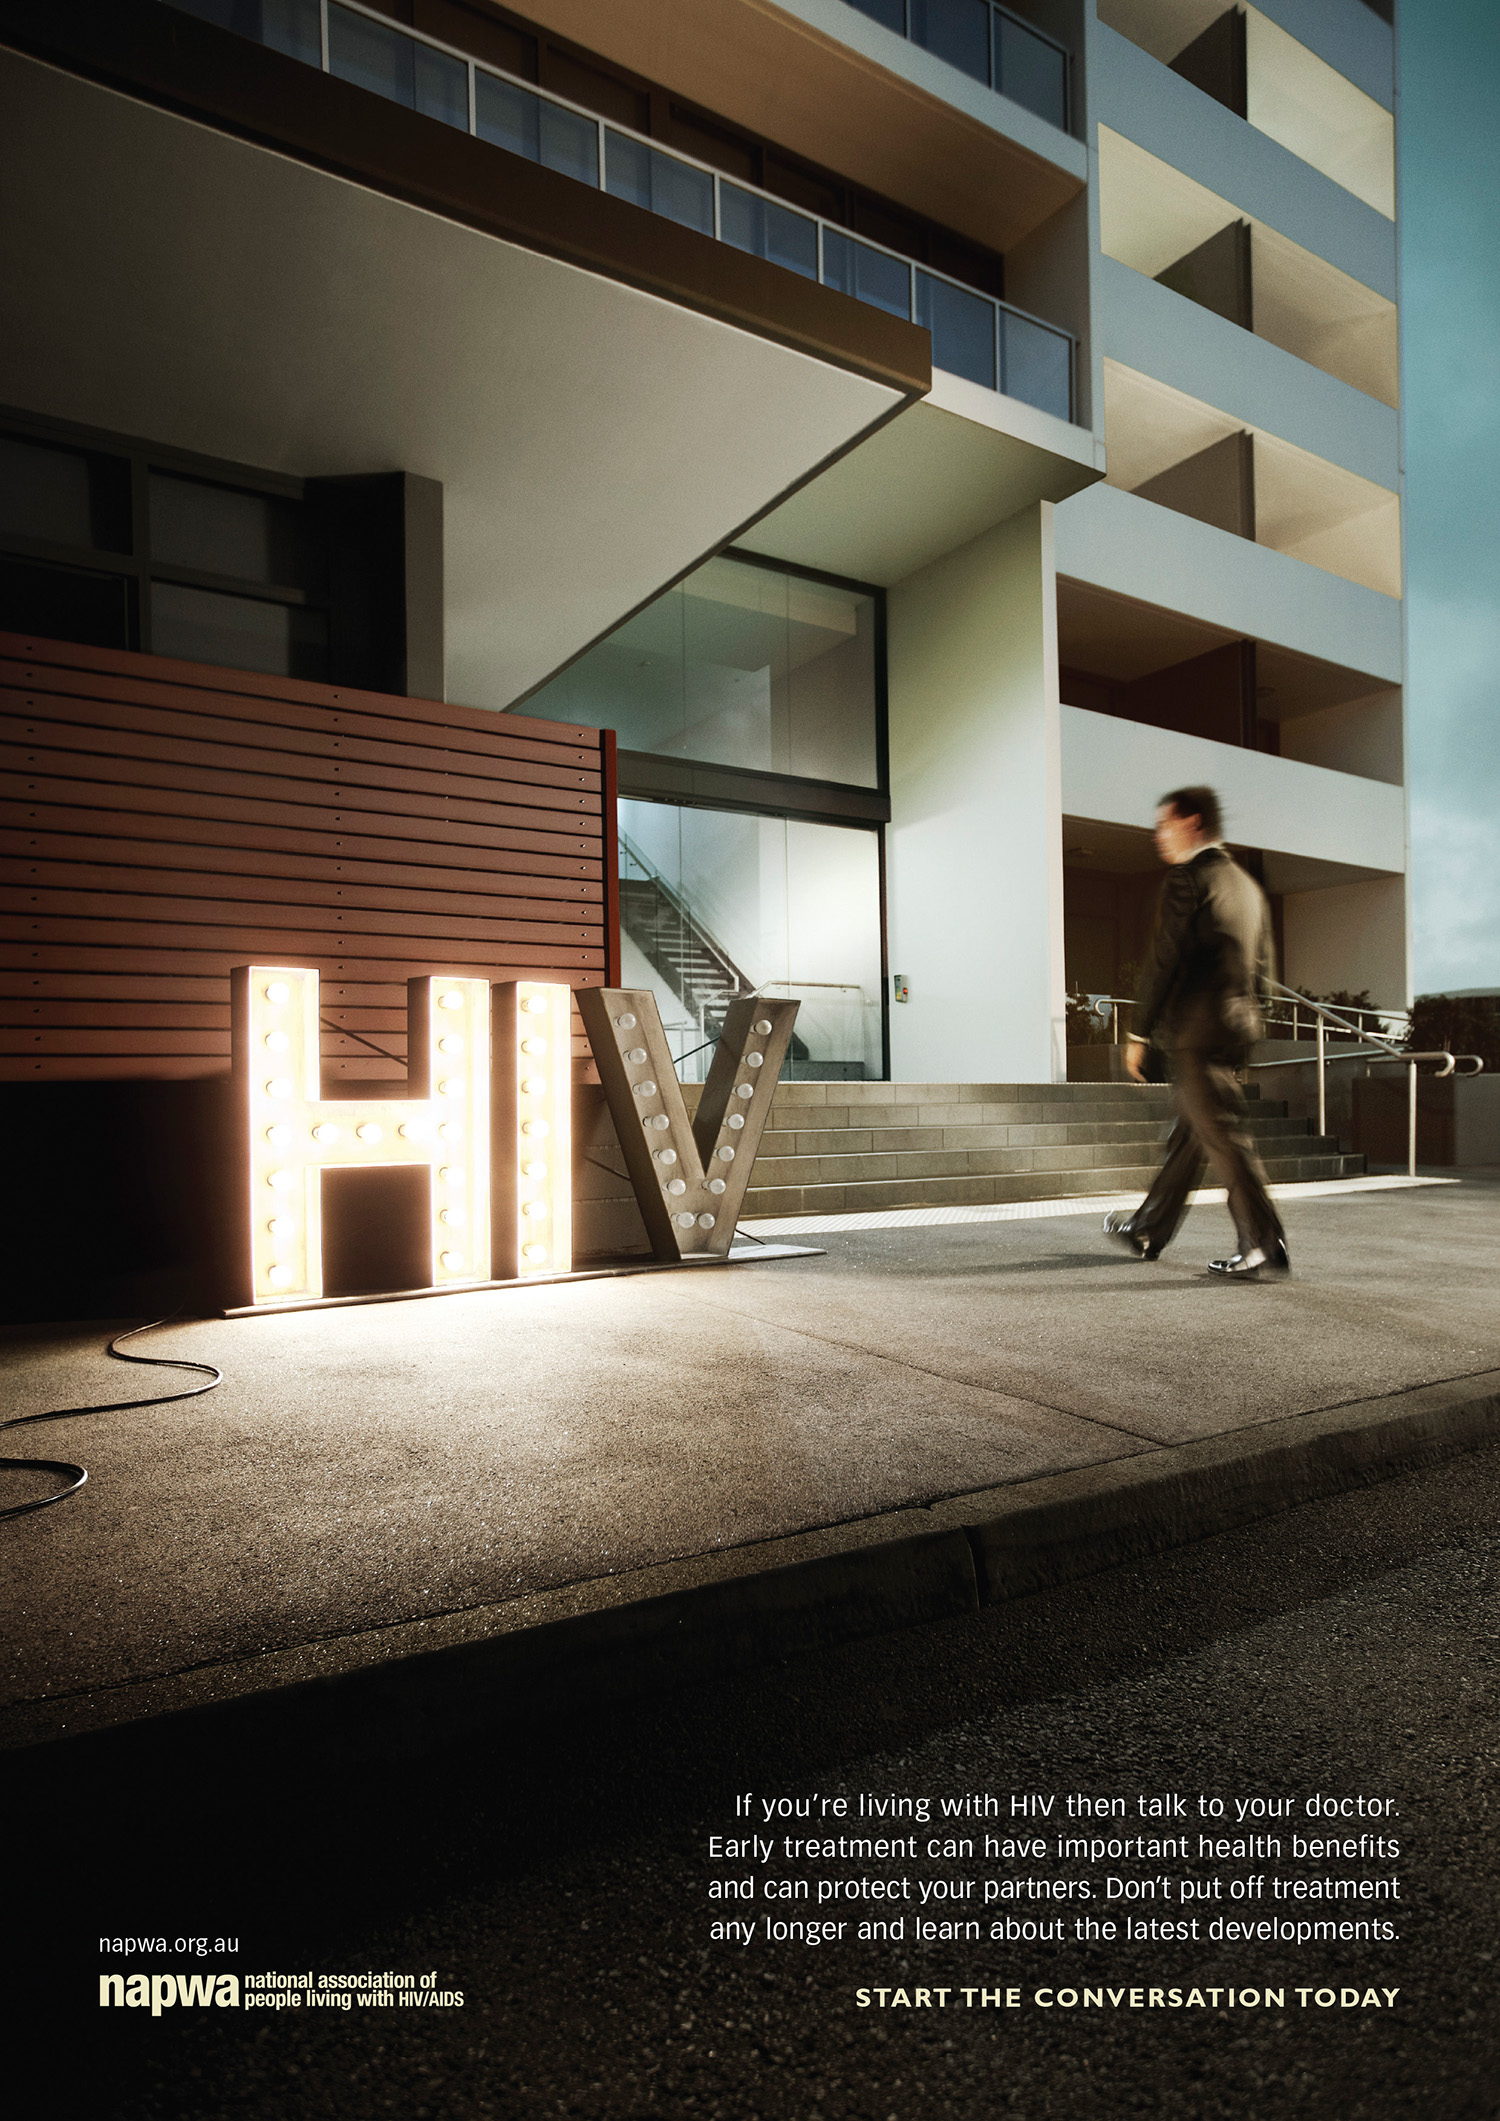 Client: NAPWA       Agency: Ward 6     Art Director: Richard Price       Copywriter: Hugh Fitzhardinge     Retouching: Cream